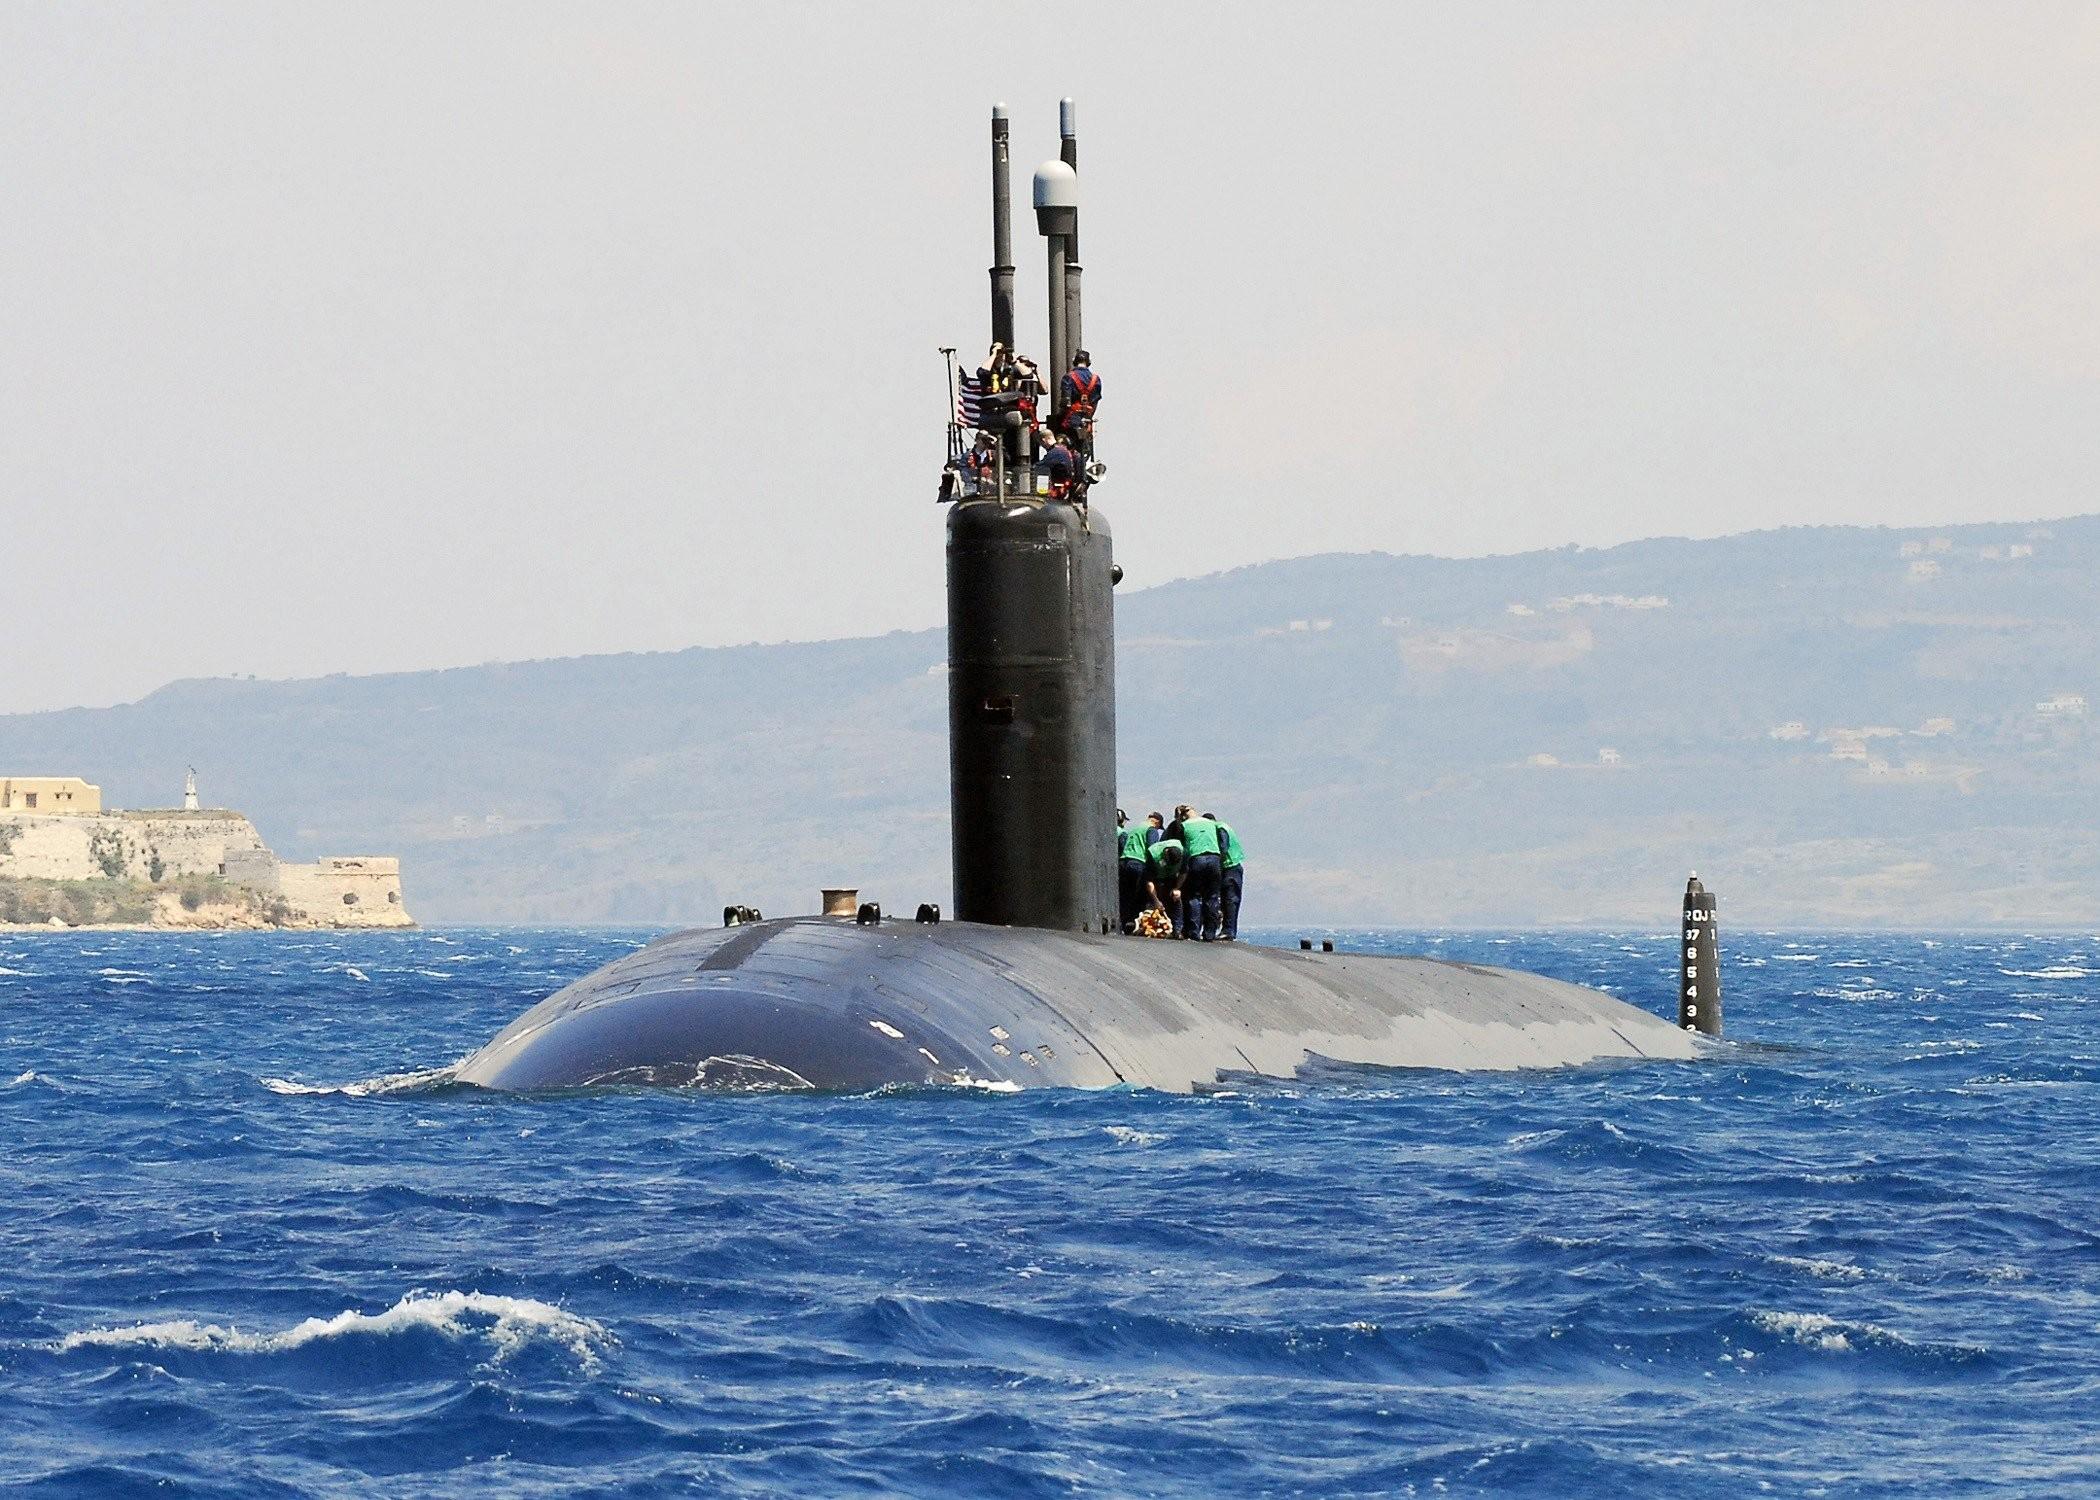 Аргентина признала смерть экипажа подлодки «Сан-Хуан»